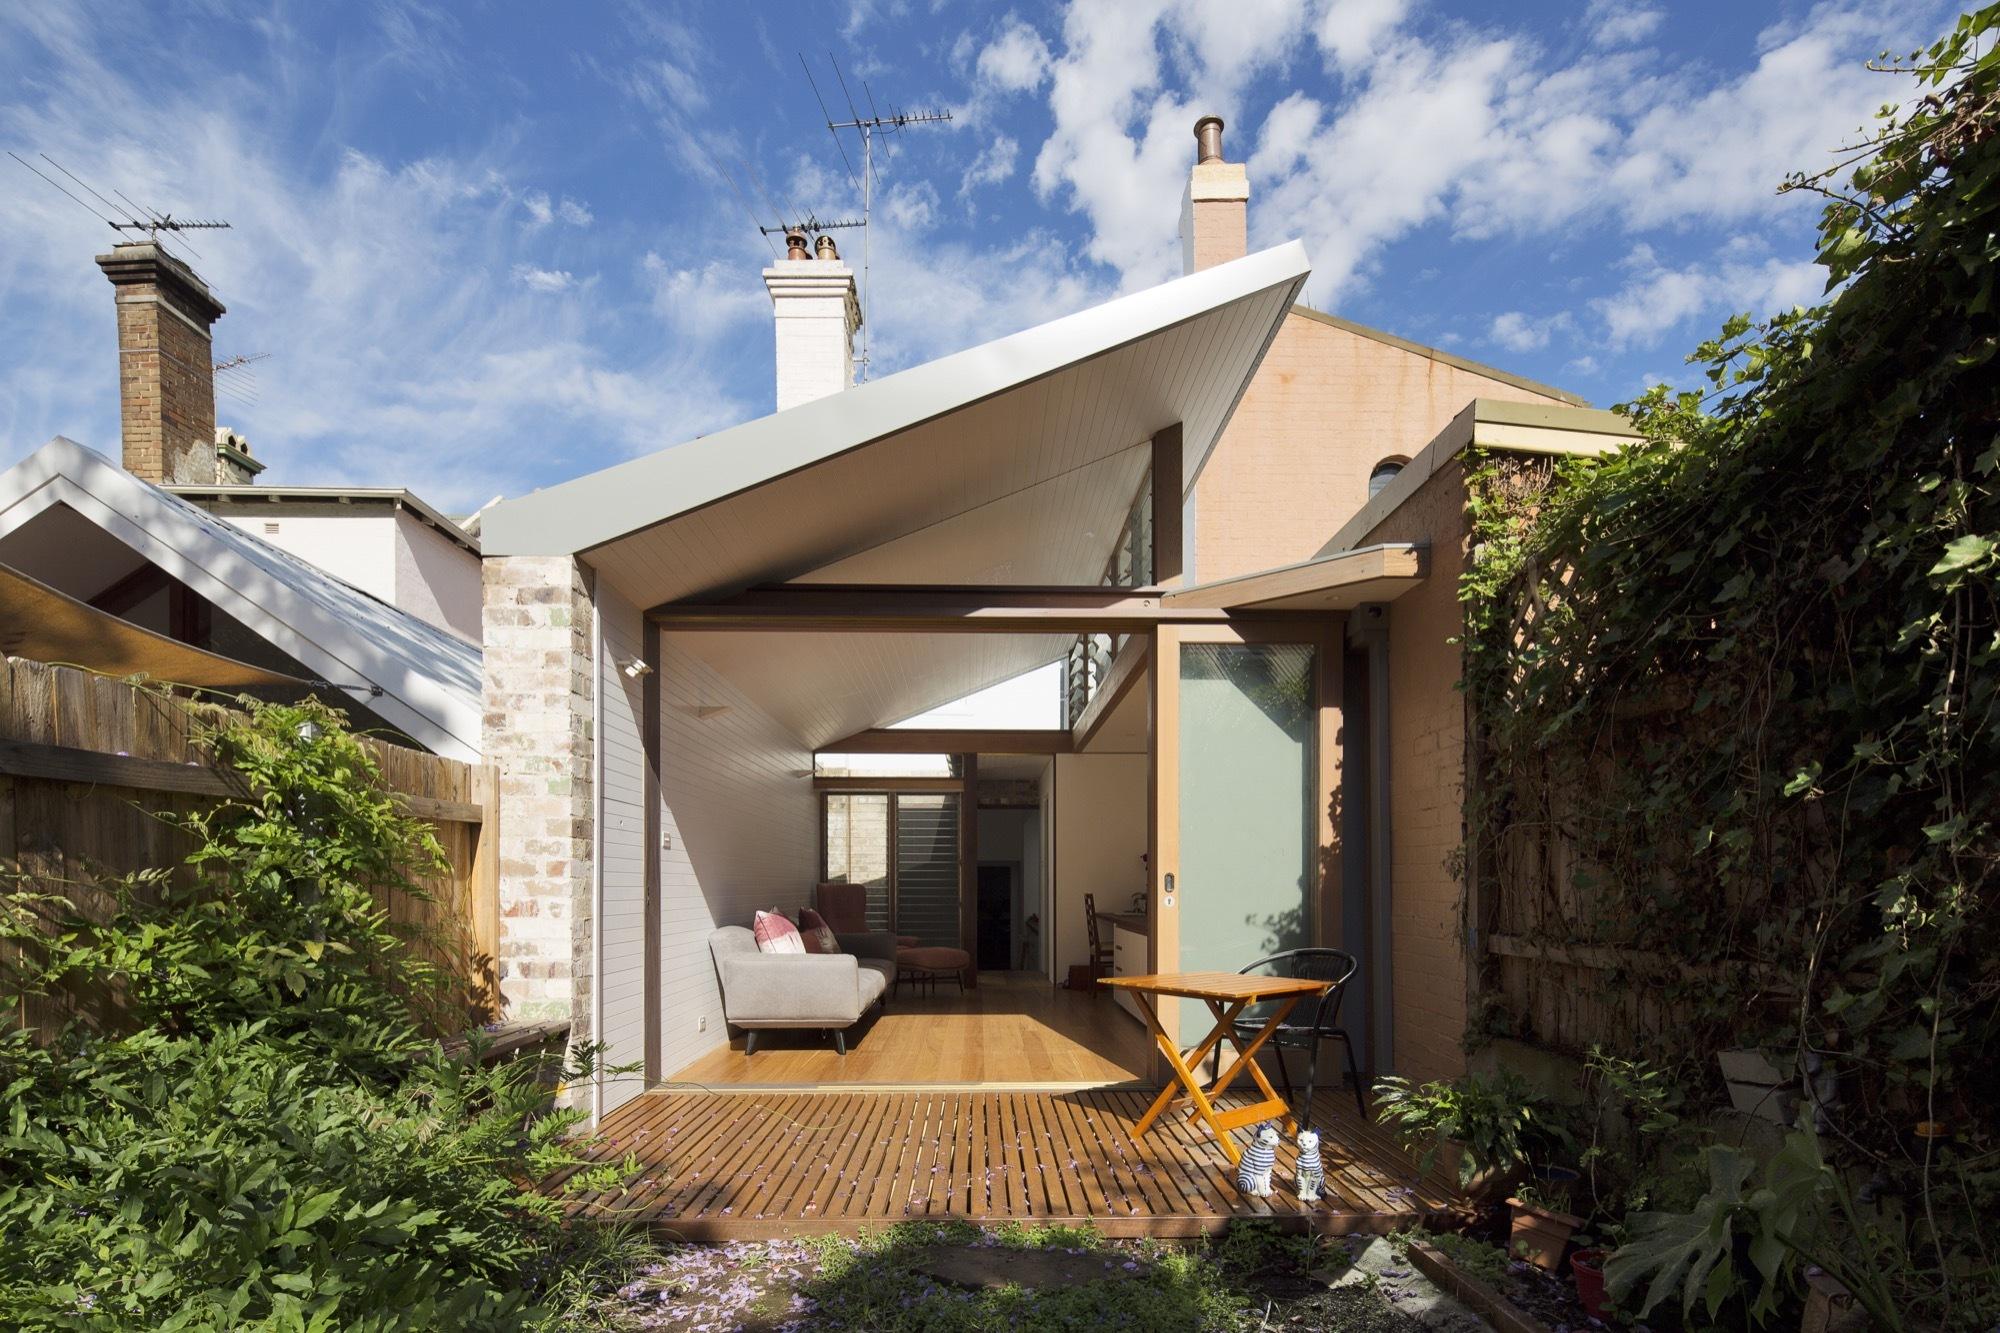 Petersham Courtyard House  Adriano Pupilli Architects